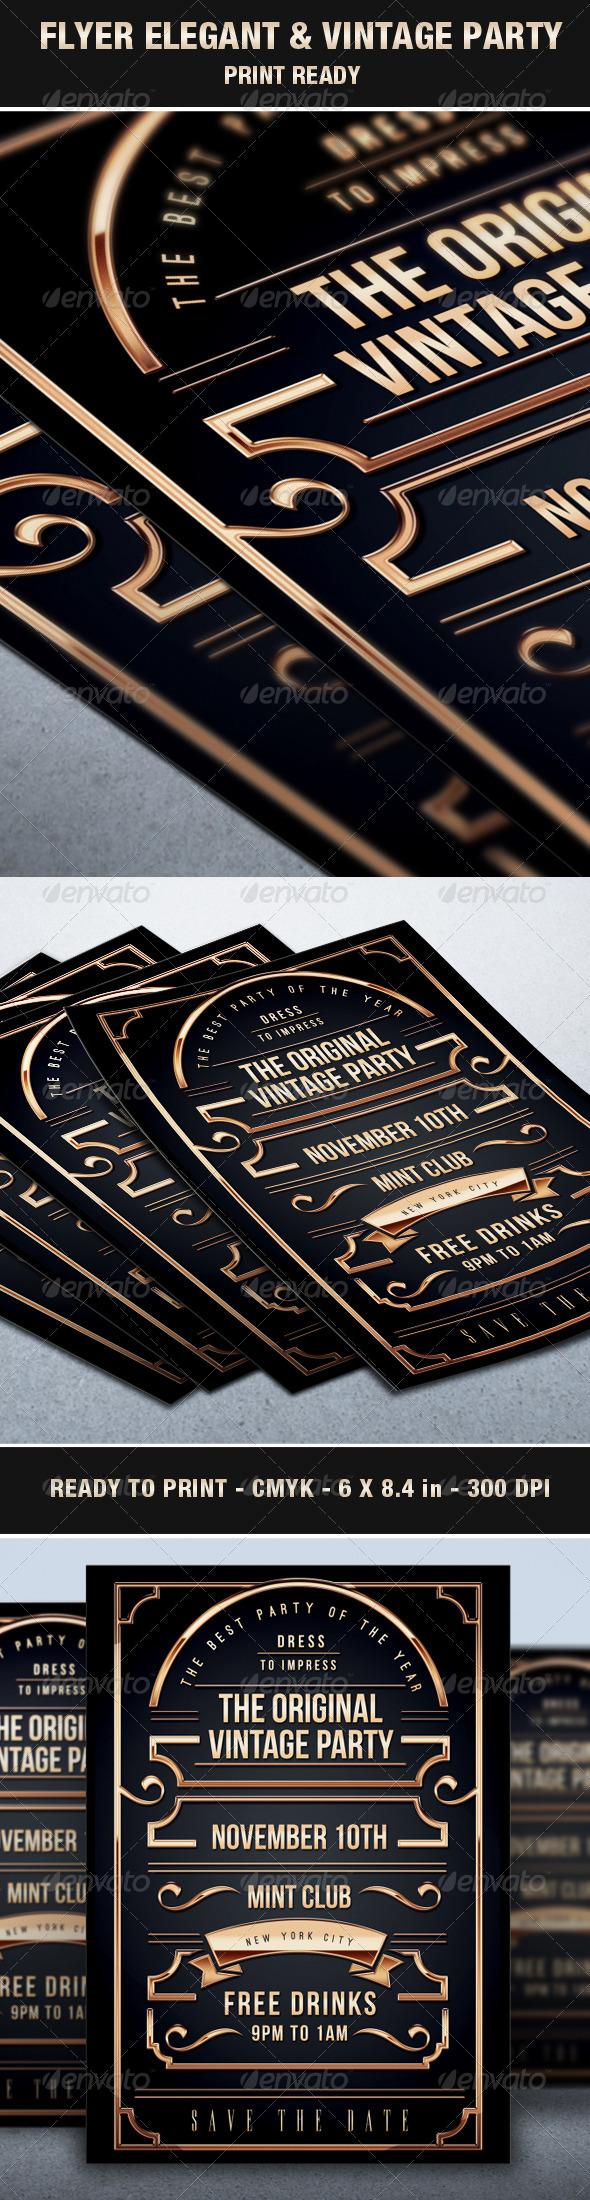 Flyer Vintage & Exclusive Party Elegant Luxury Vip - Events Flyers